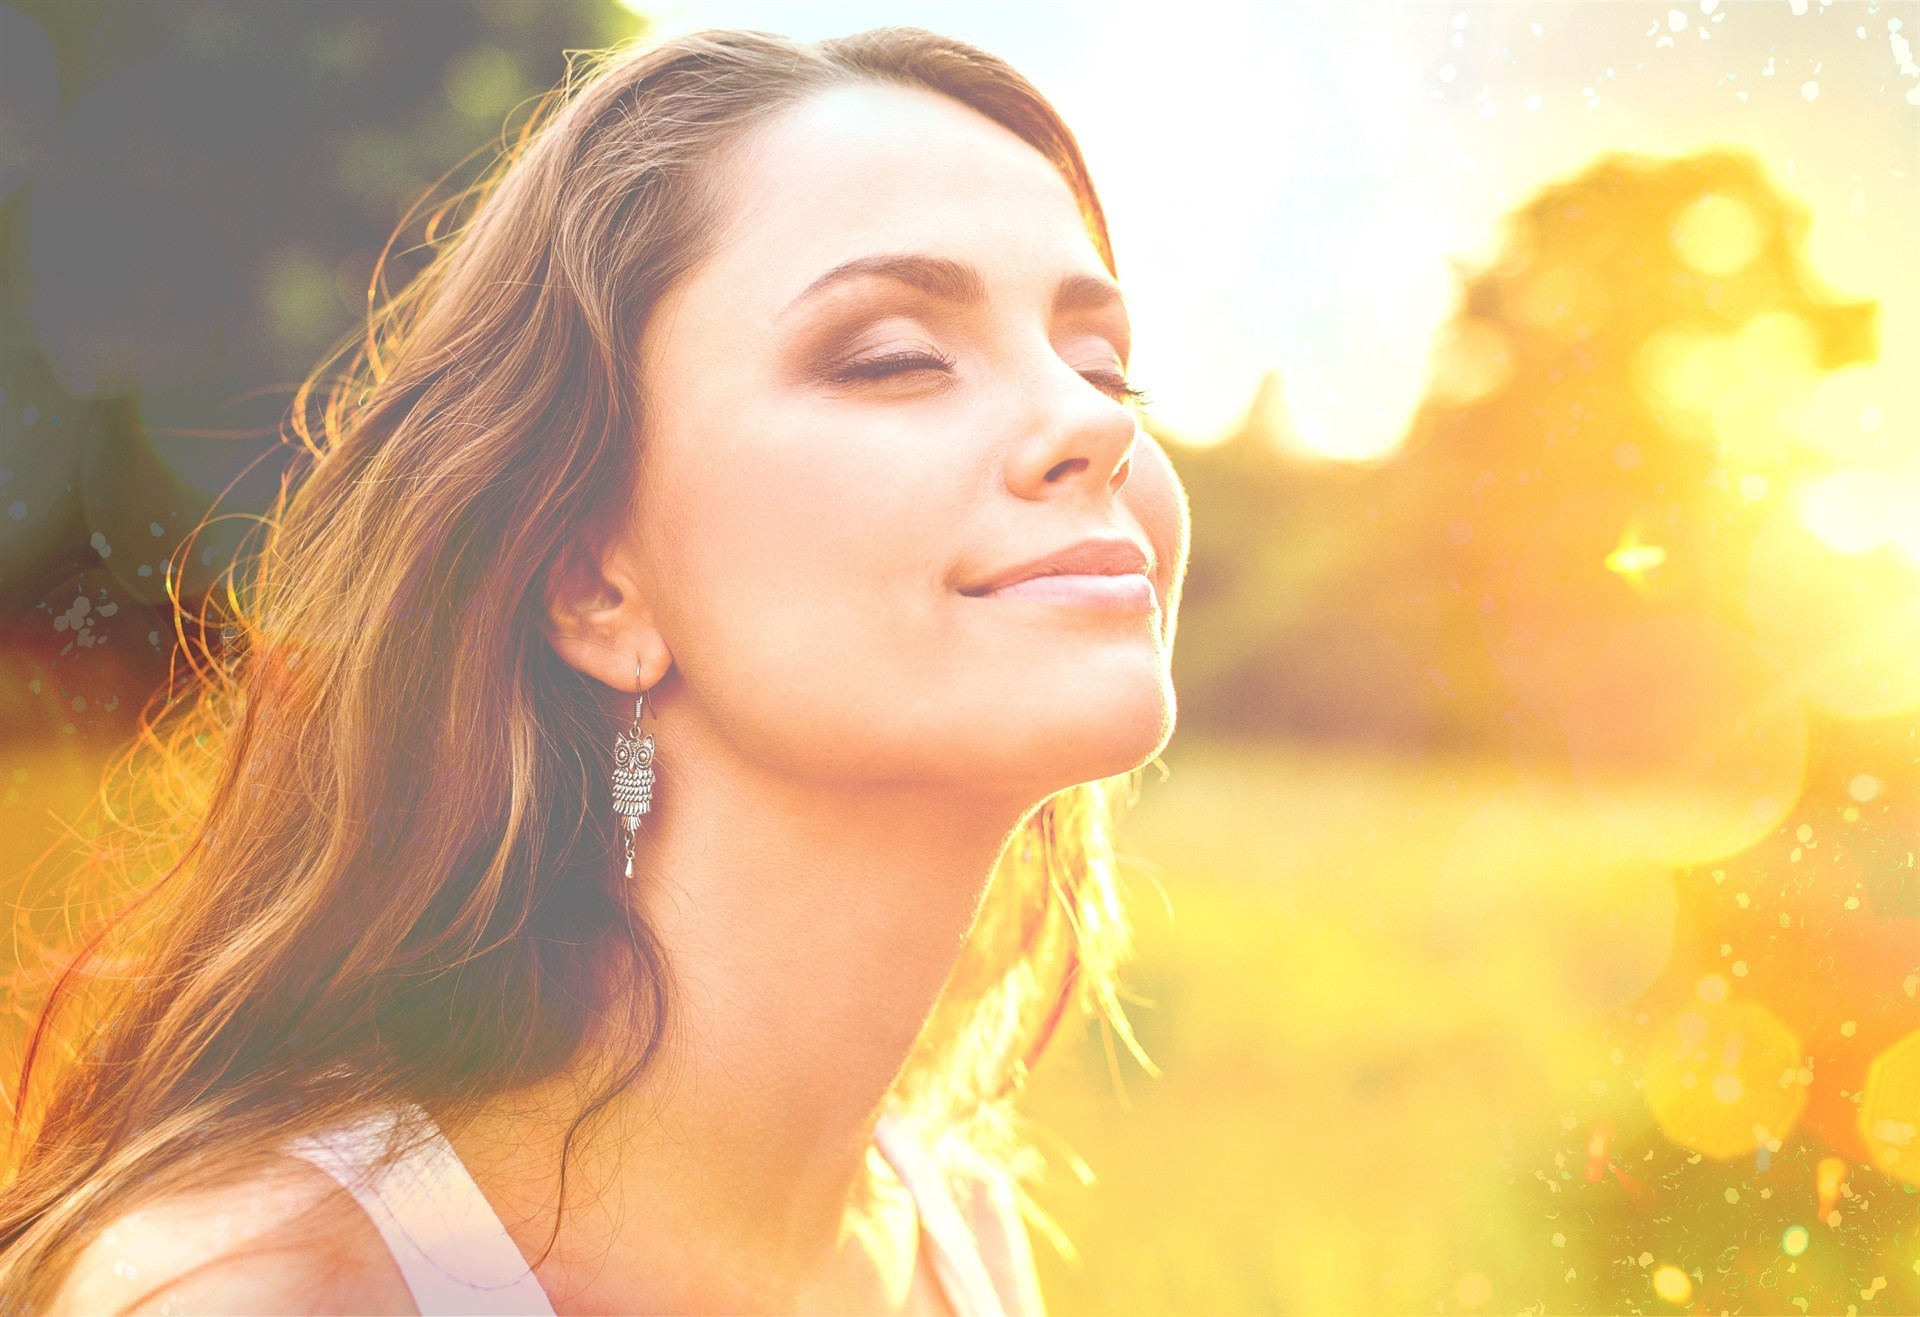 Rejuvenate your skin with IPL